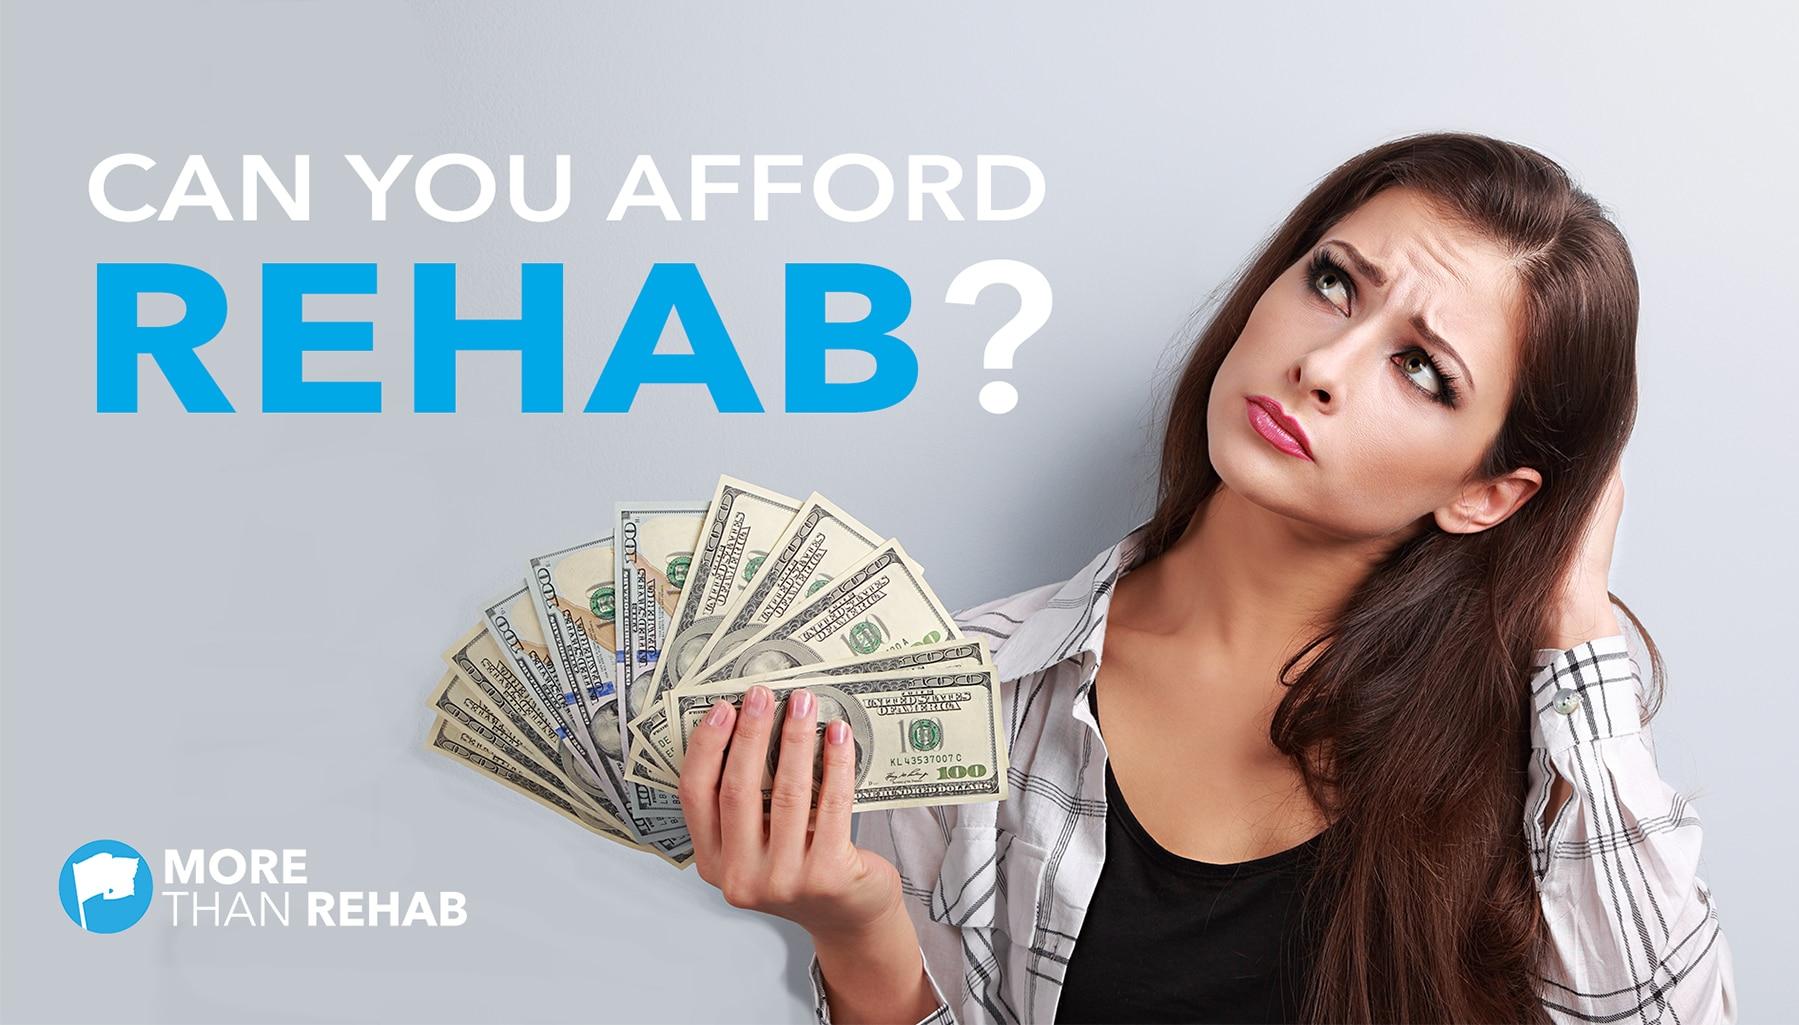 can-you-afford-drug-rehab-insurance-addiction-treatment-options-Houston-Texas-detox-More-Than-Rehab